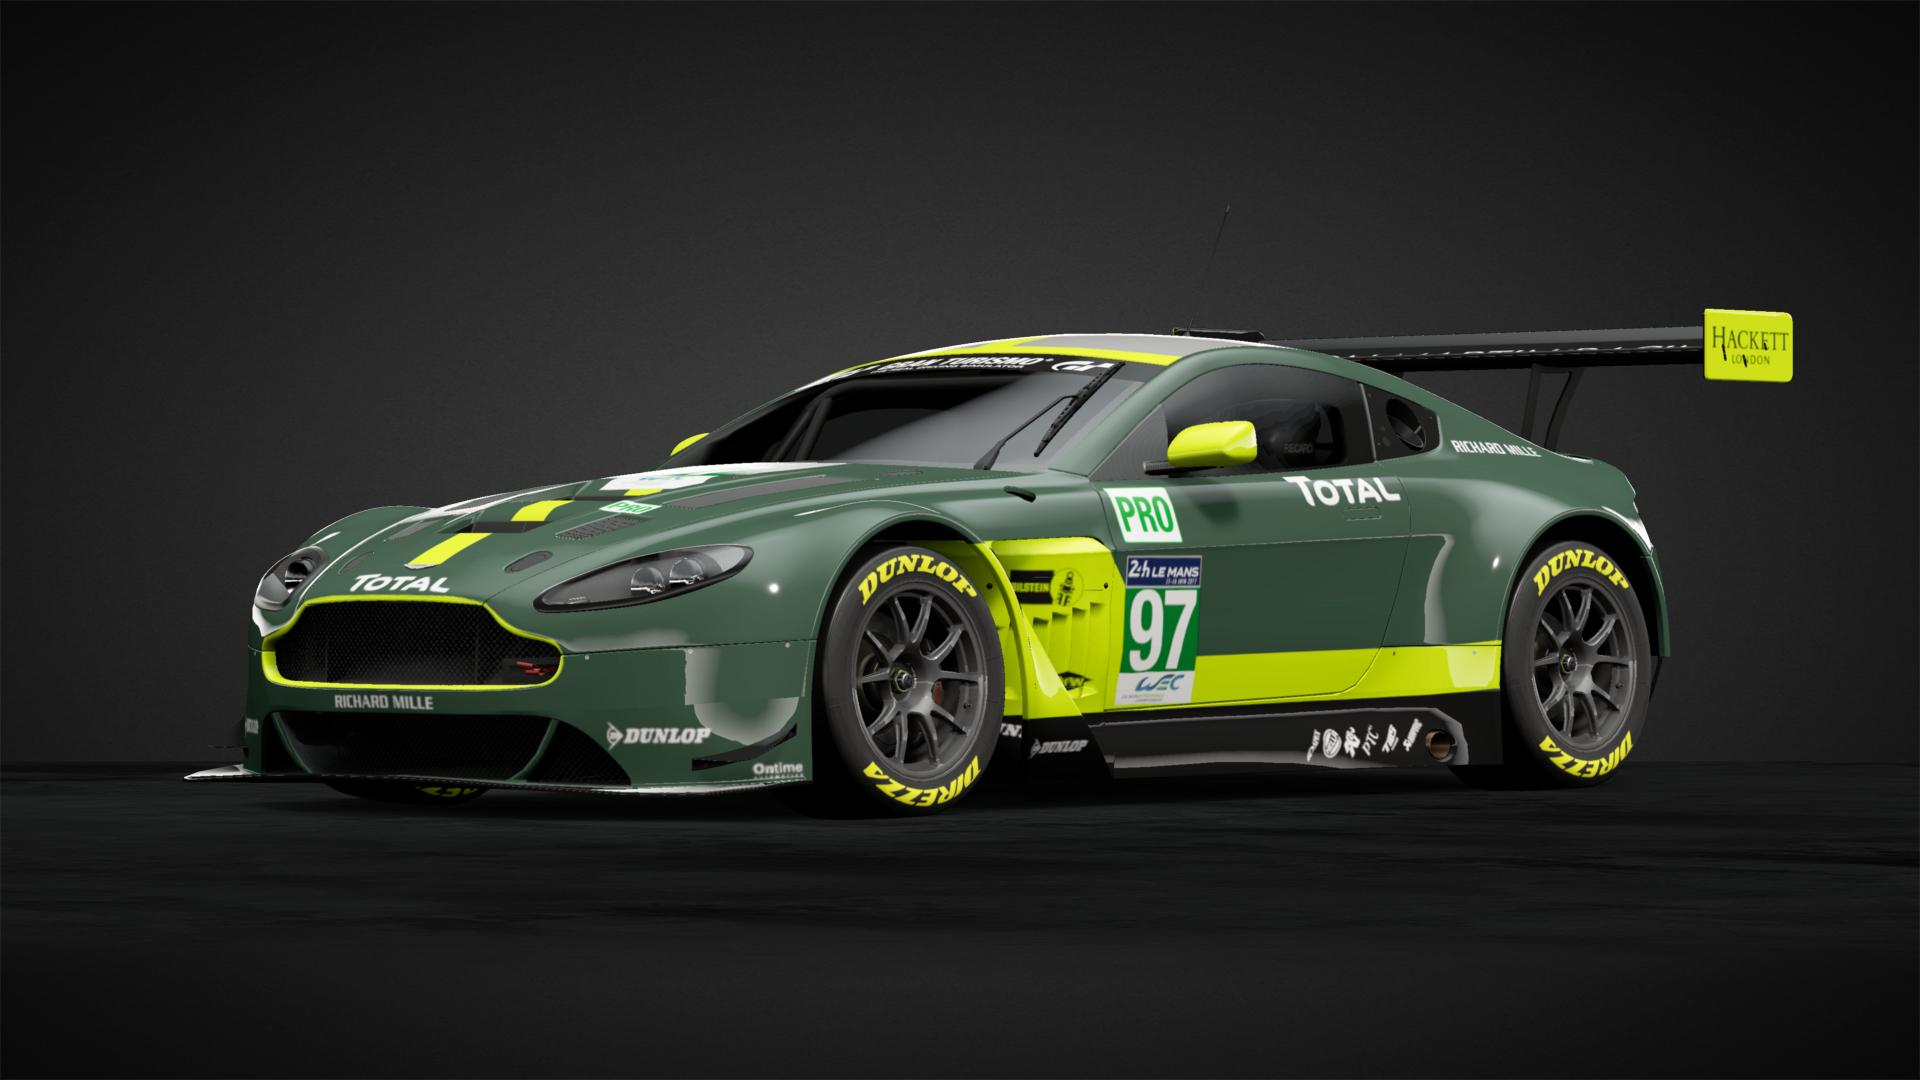 Aston Martin Racing Car Livery By Warwolf511 Community Gran Turismo Sport